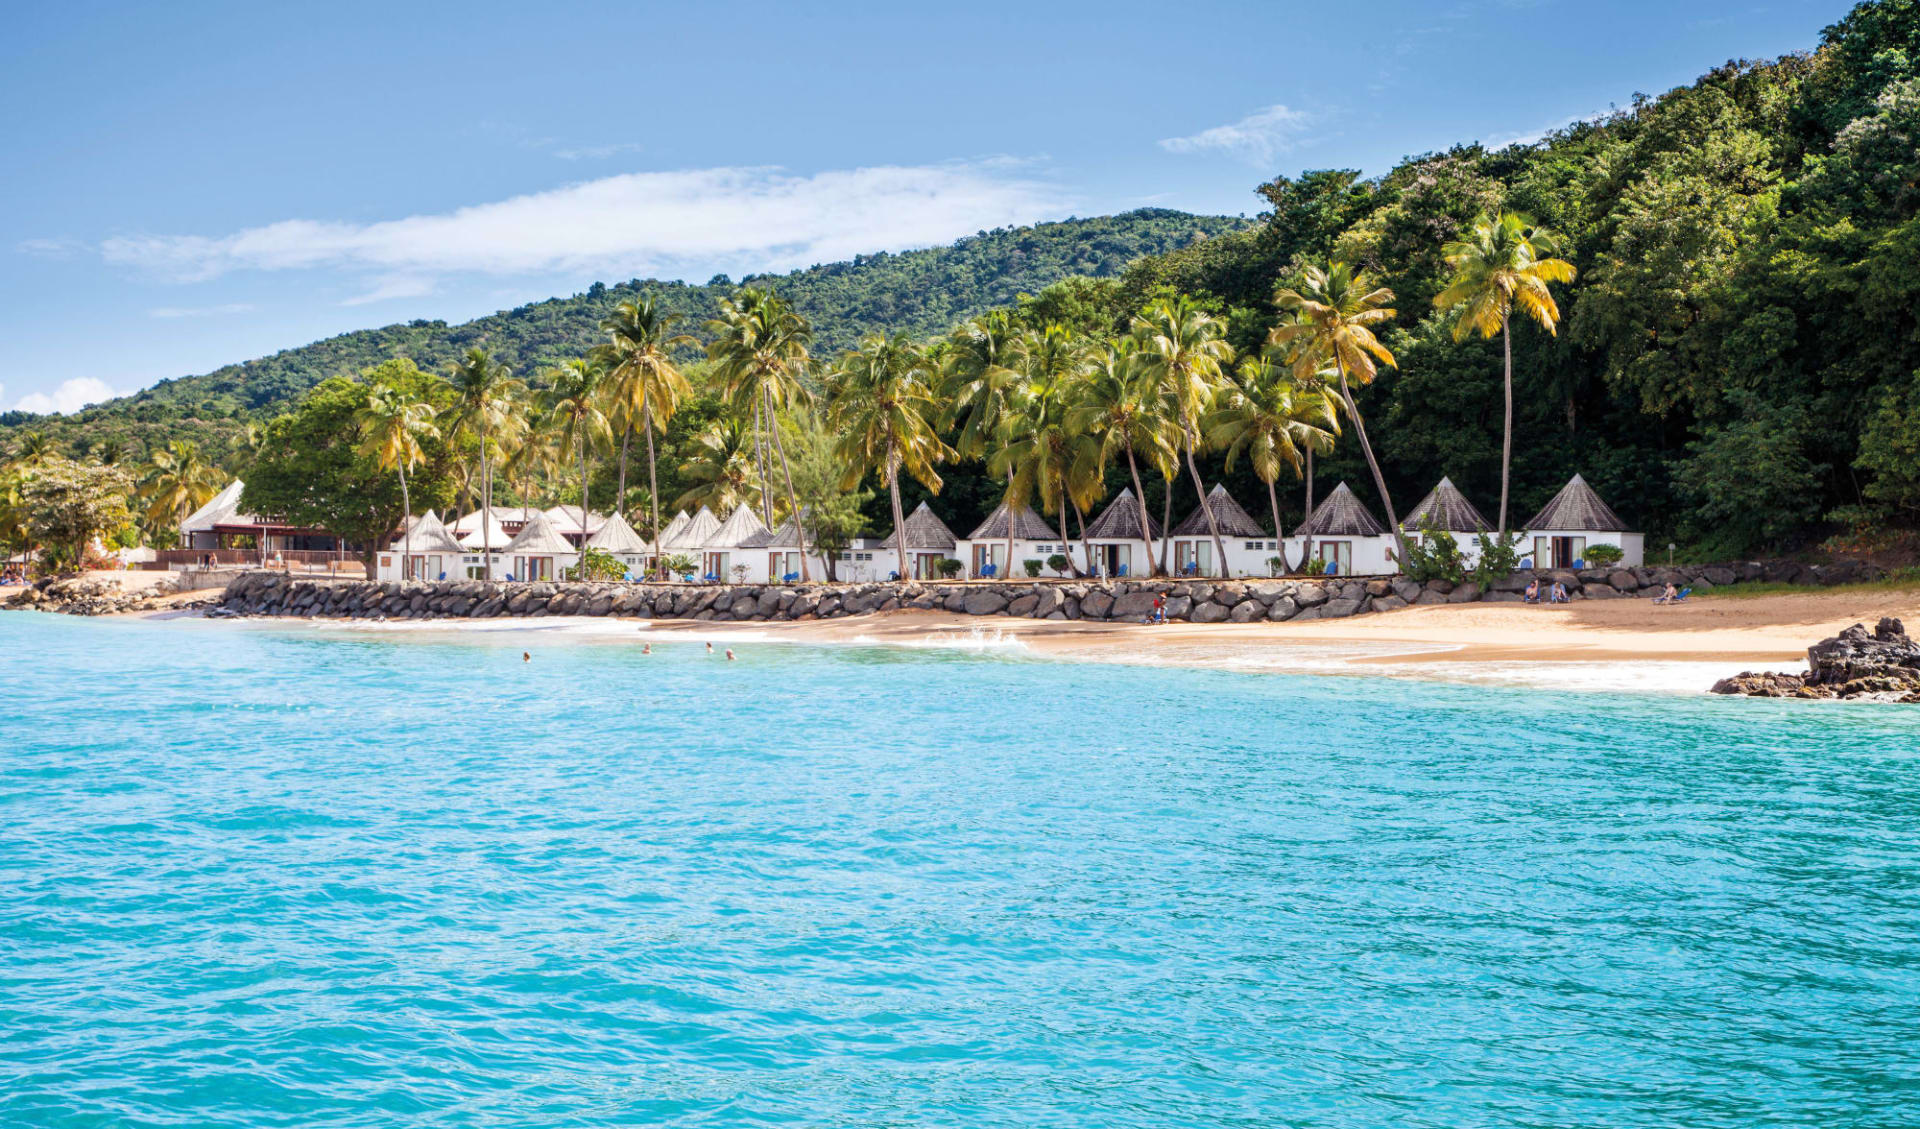 Langley Resort Fort Royal in Deshaies:  Guadeloupe_Langley Resort Fort Royal_Beach